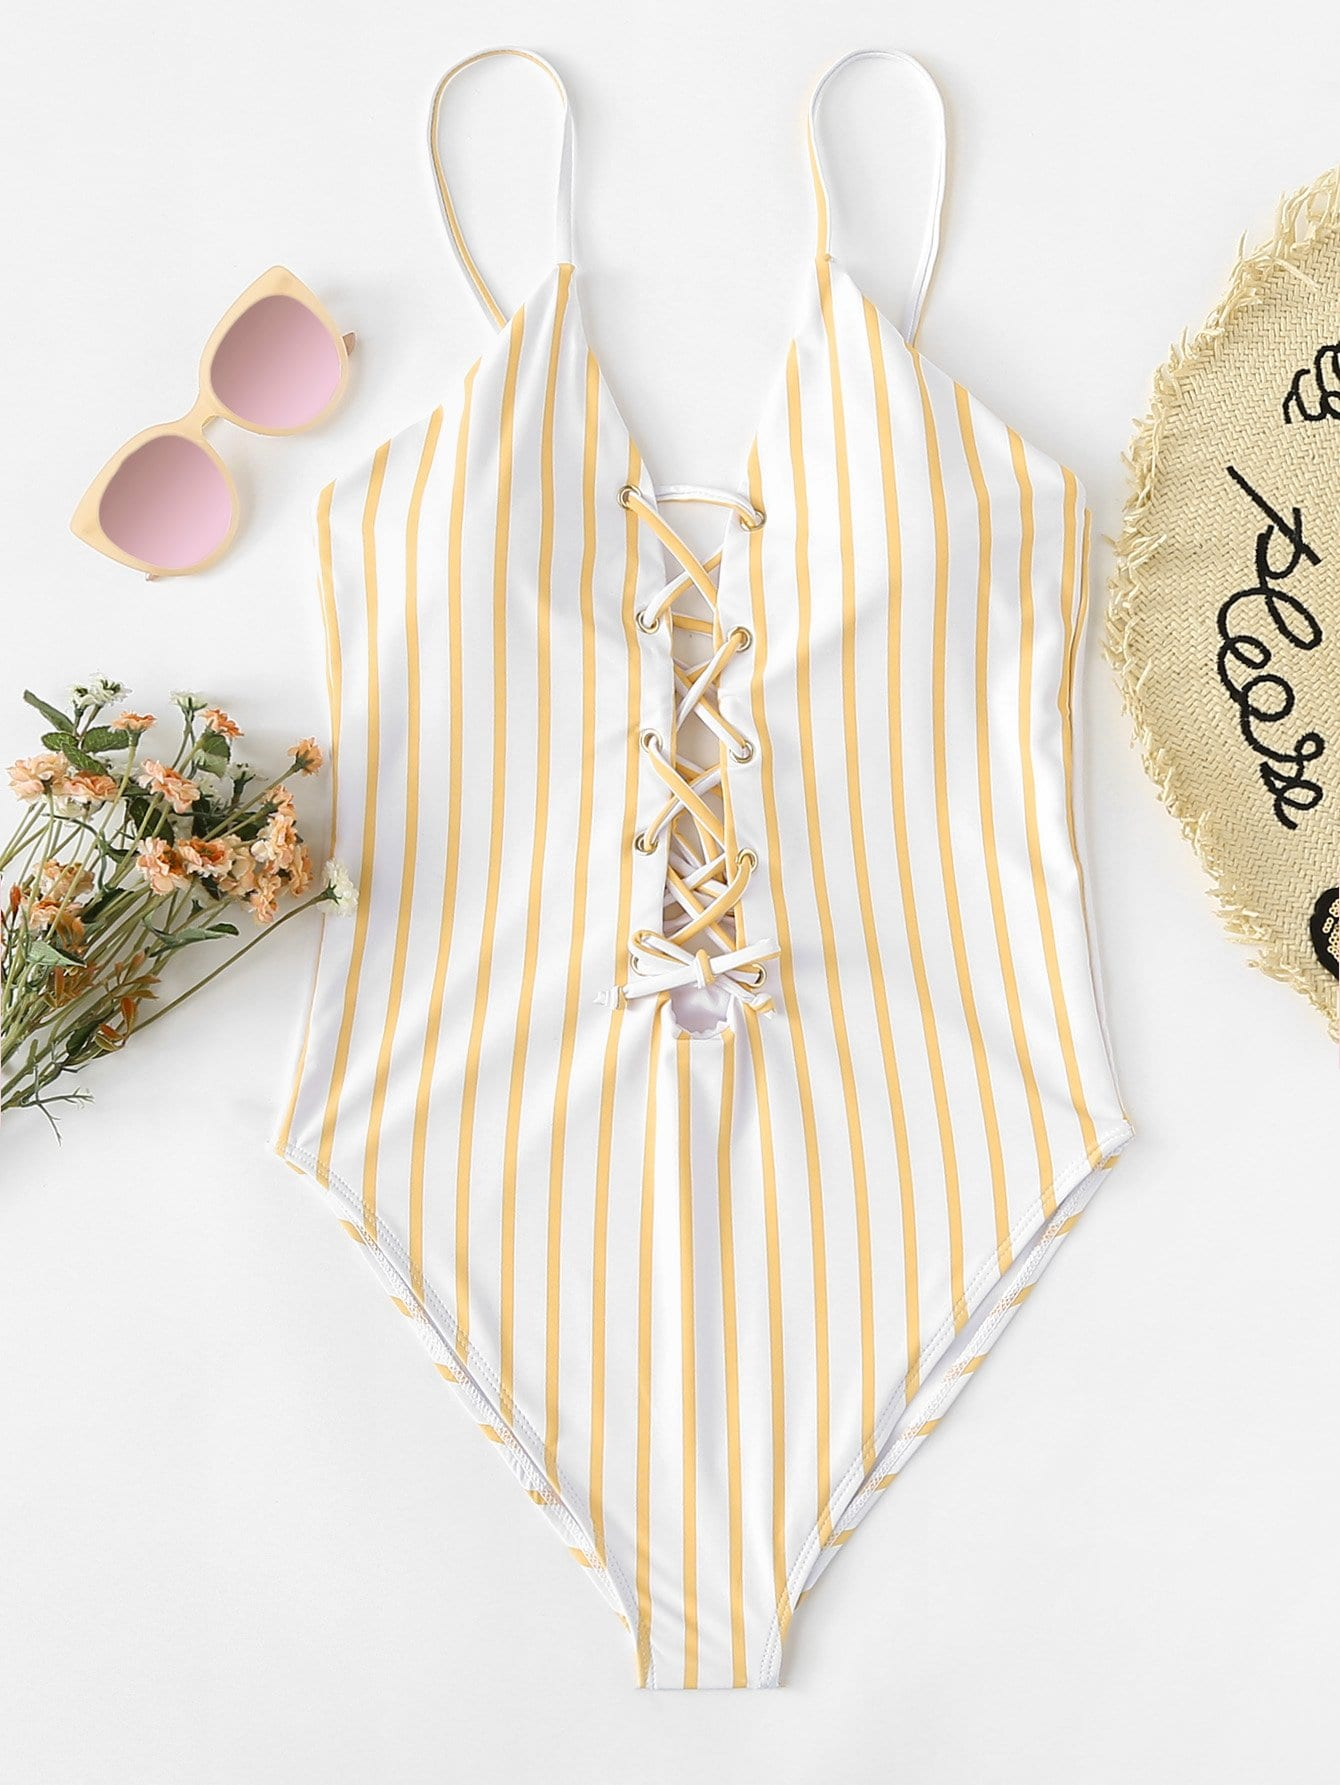 Lace Up Striped Swimsuit lace up striped swimsuit